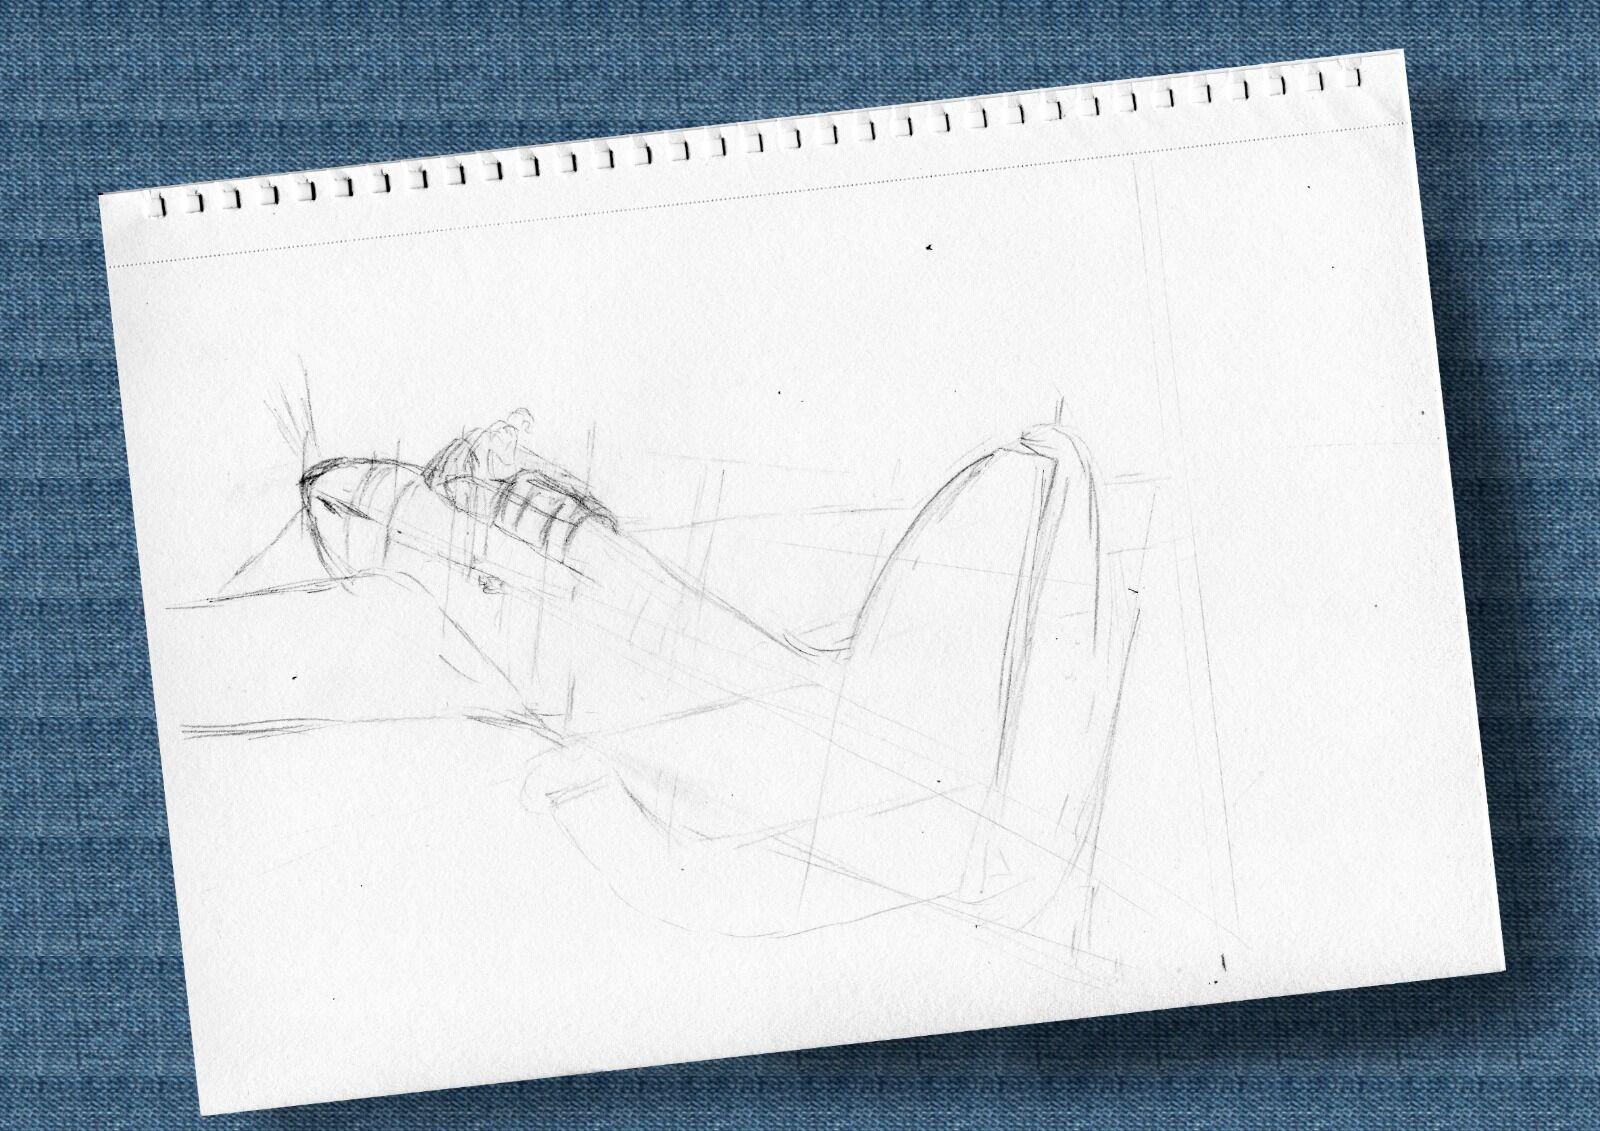 Hurricane sketch mounted